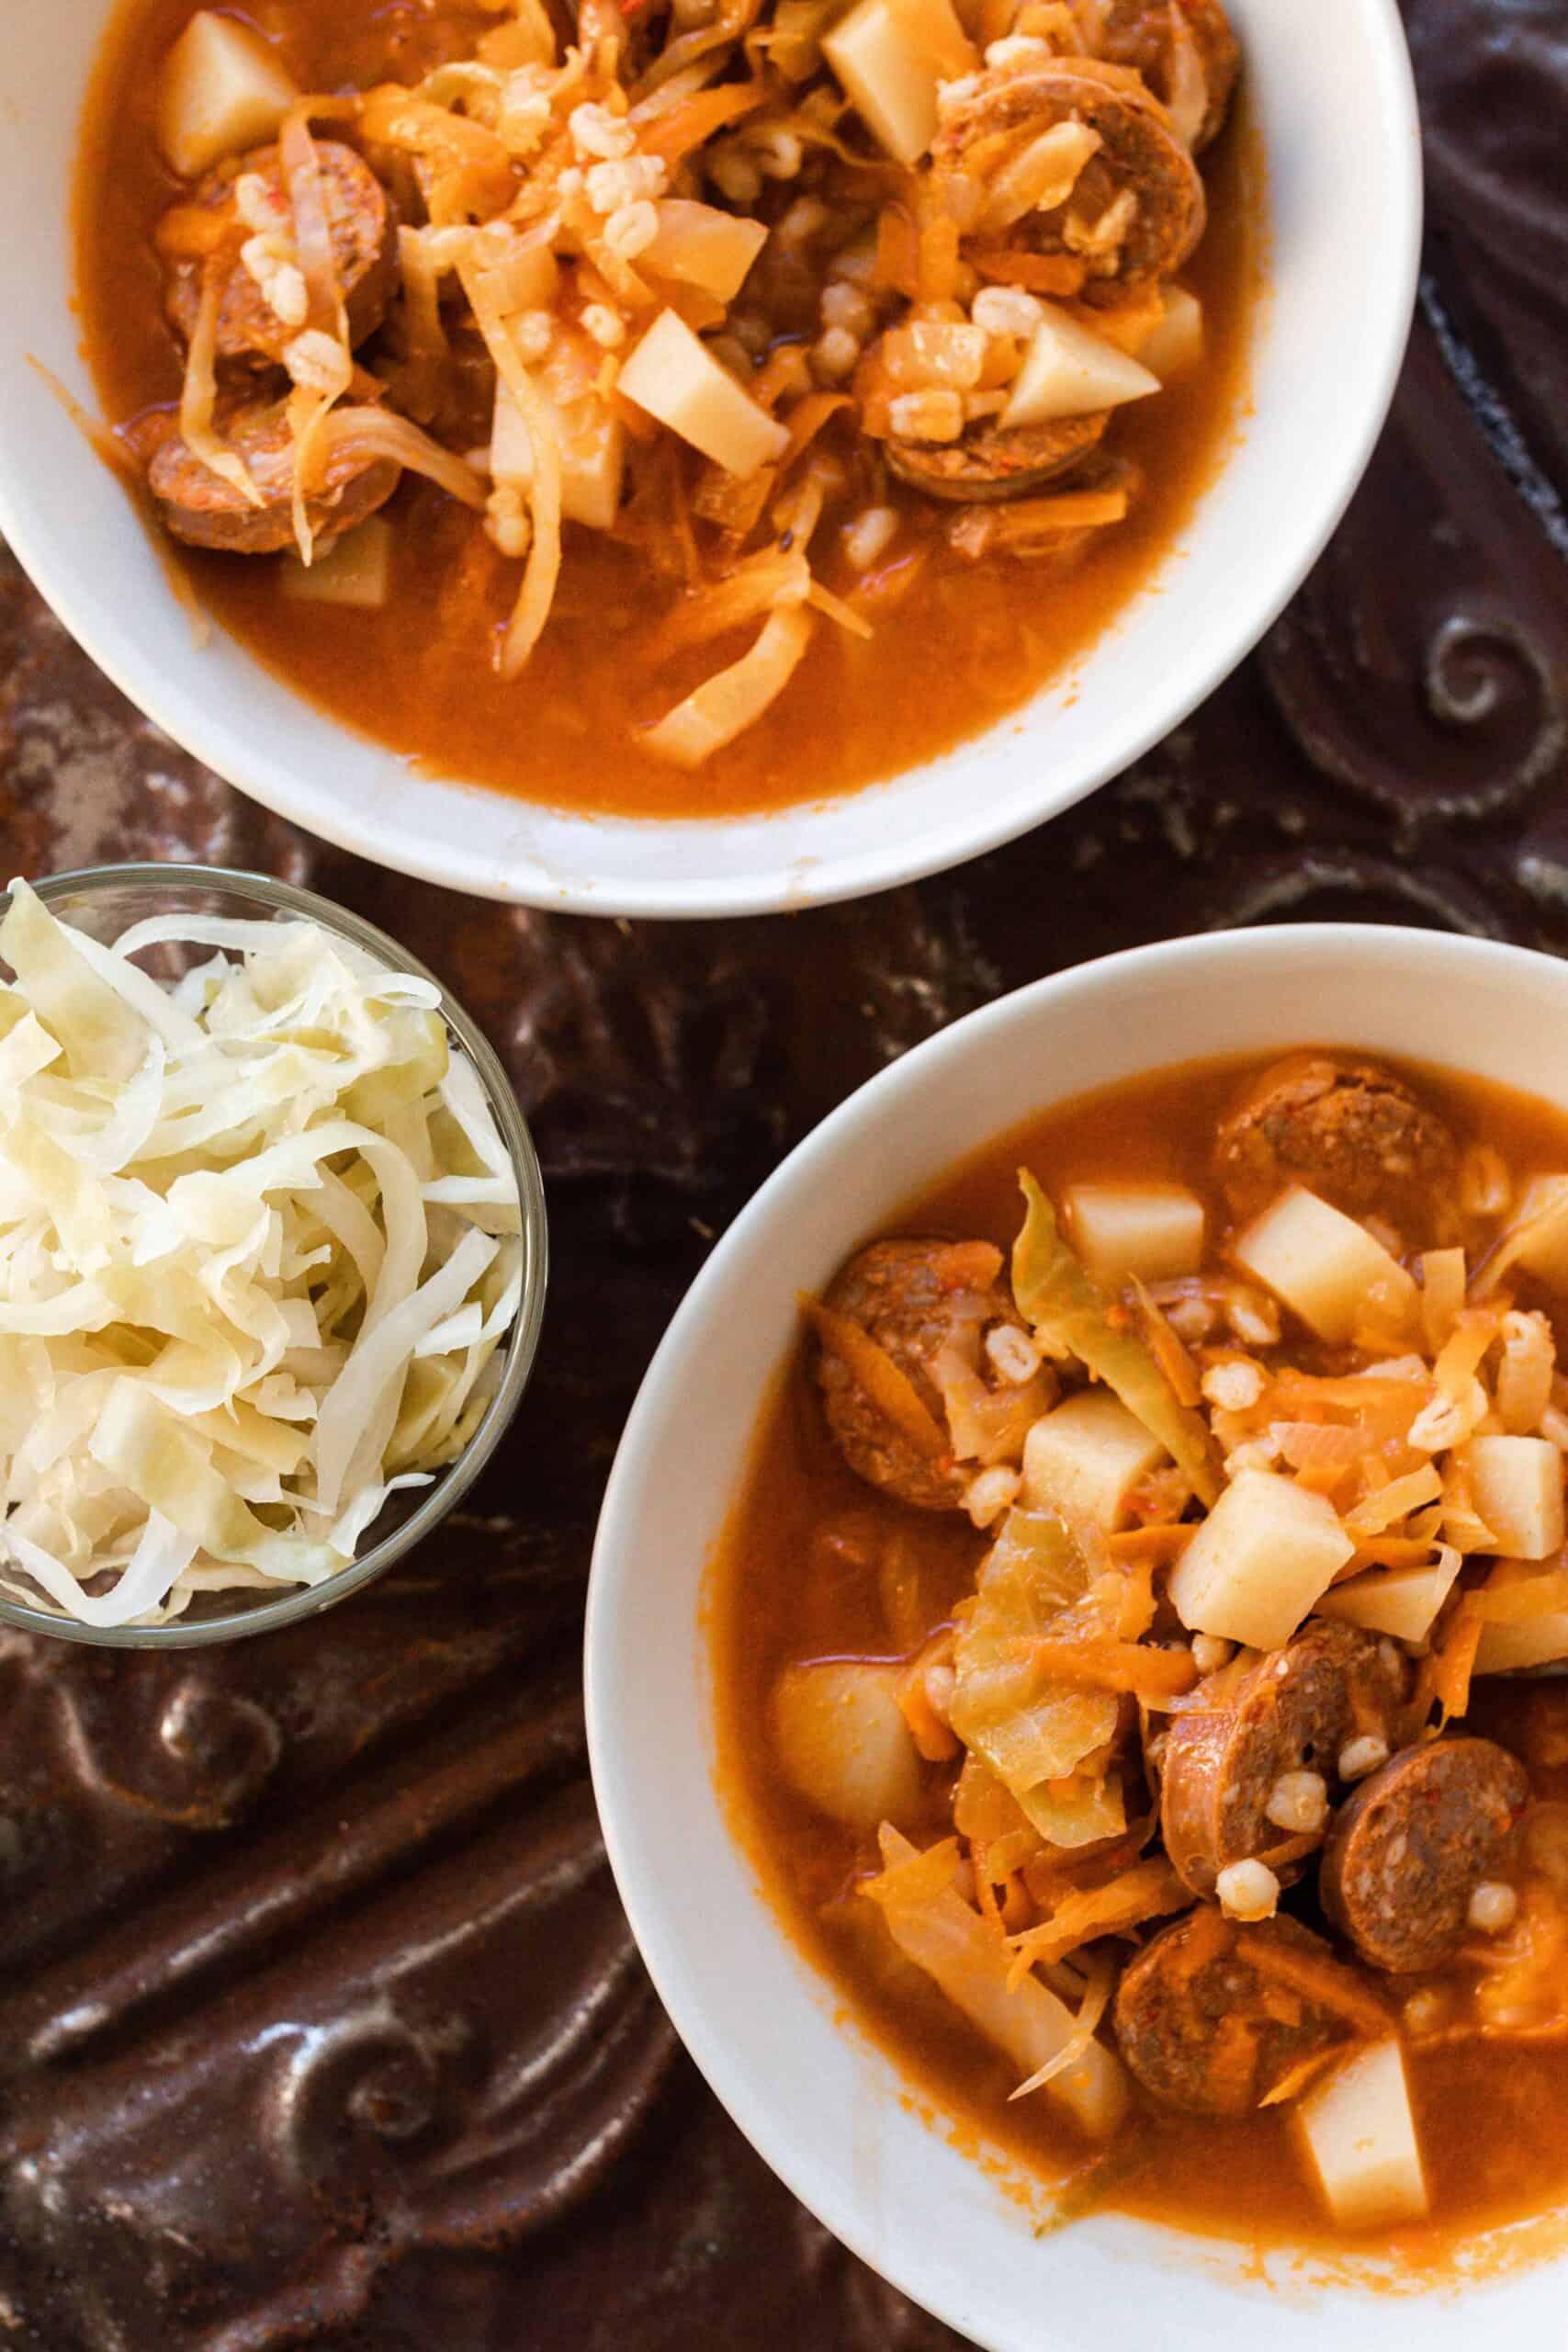 two bowls of sausage sauerkraut soup